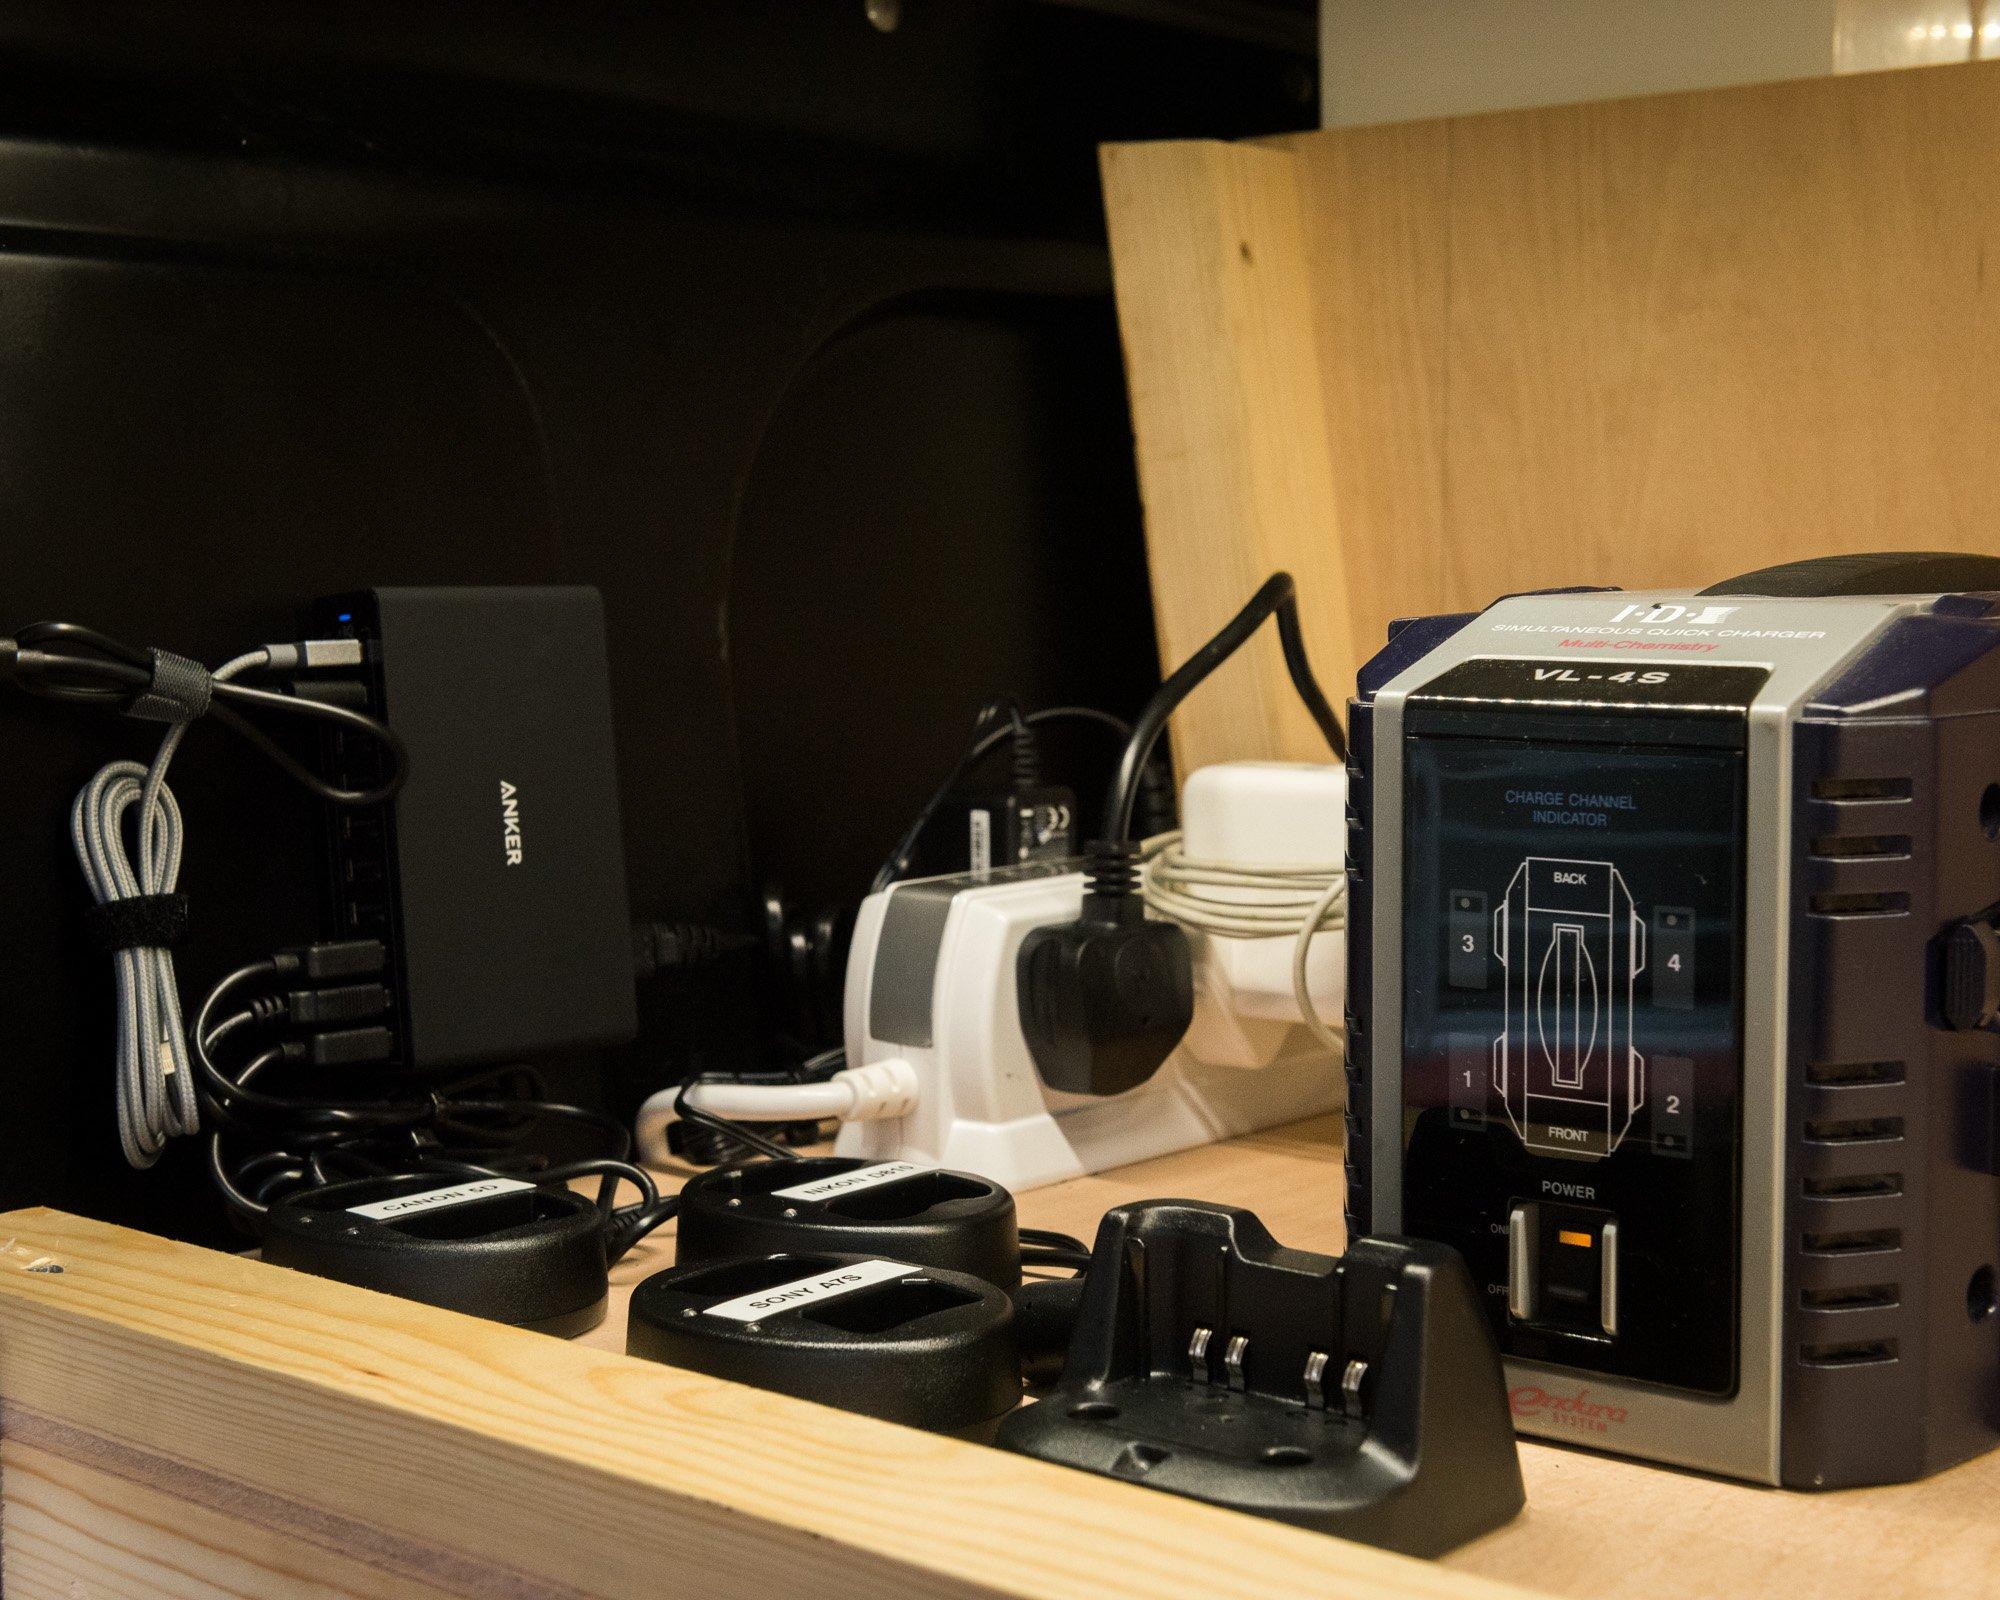 Camera charging station in location filming van